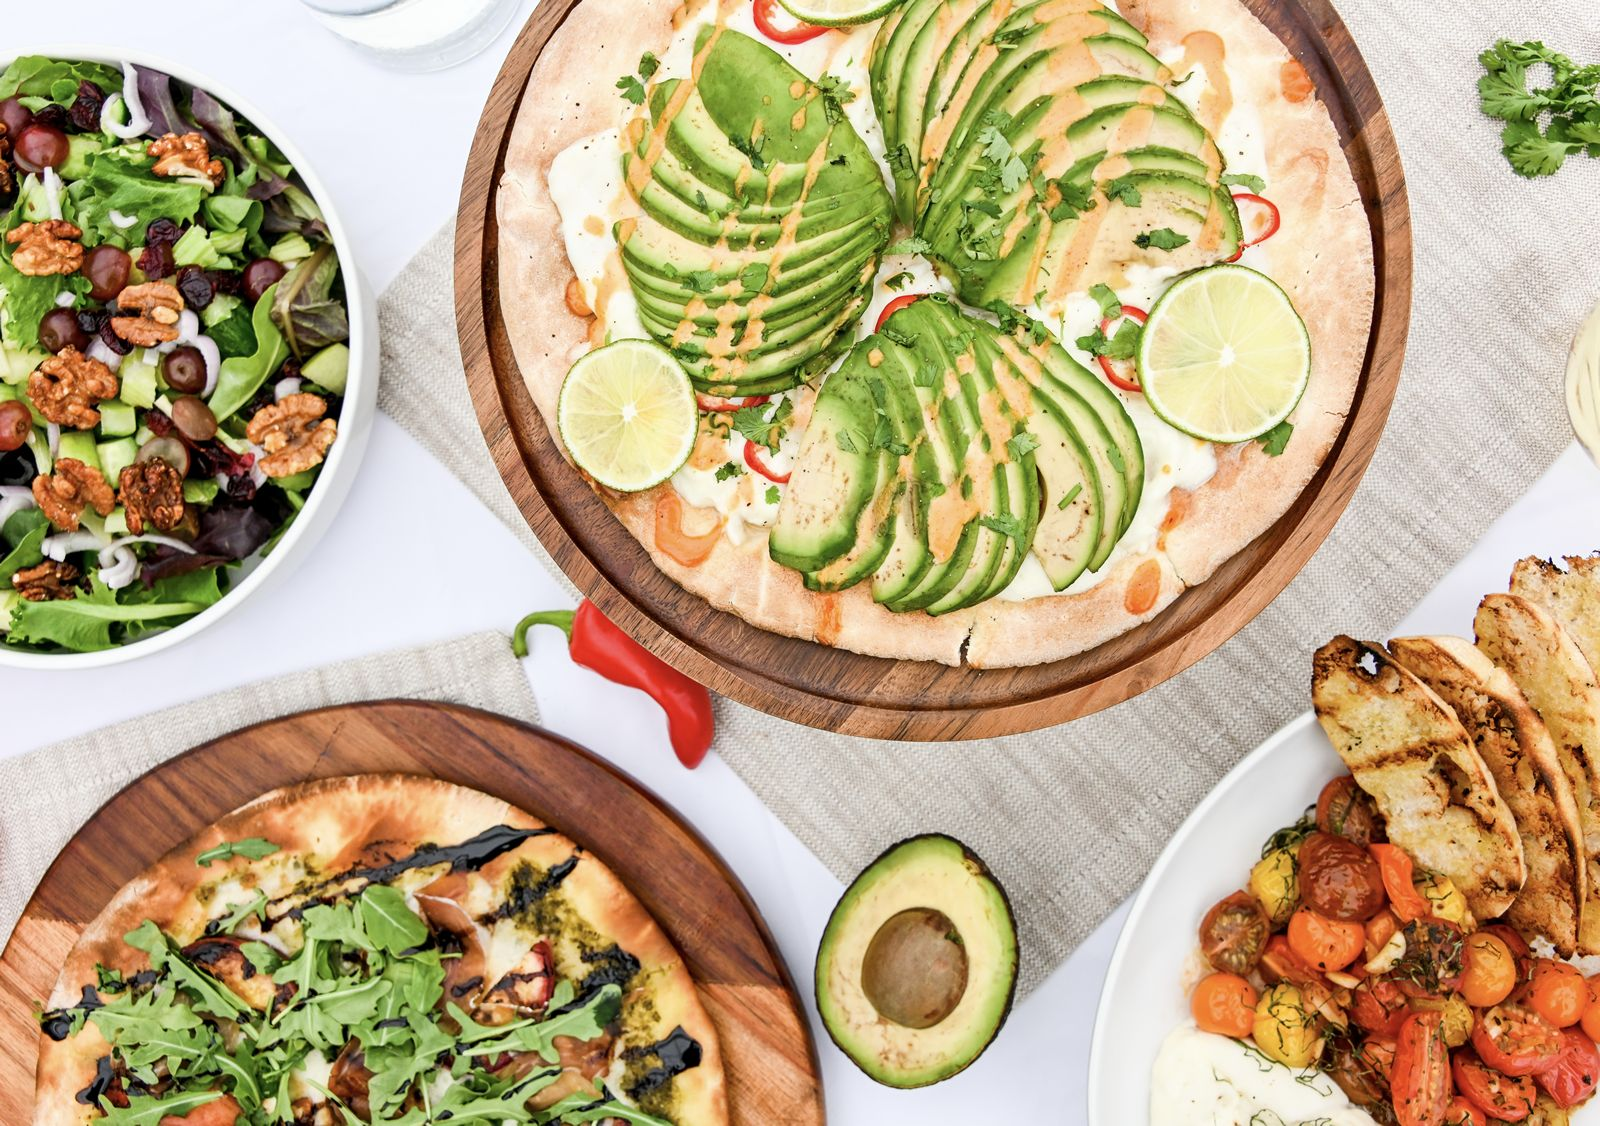 Soak Up the Final Days of Summer with Greenleaf Kitchen & Cocktails' Seasonal Menu